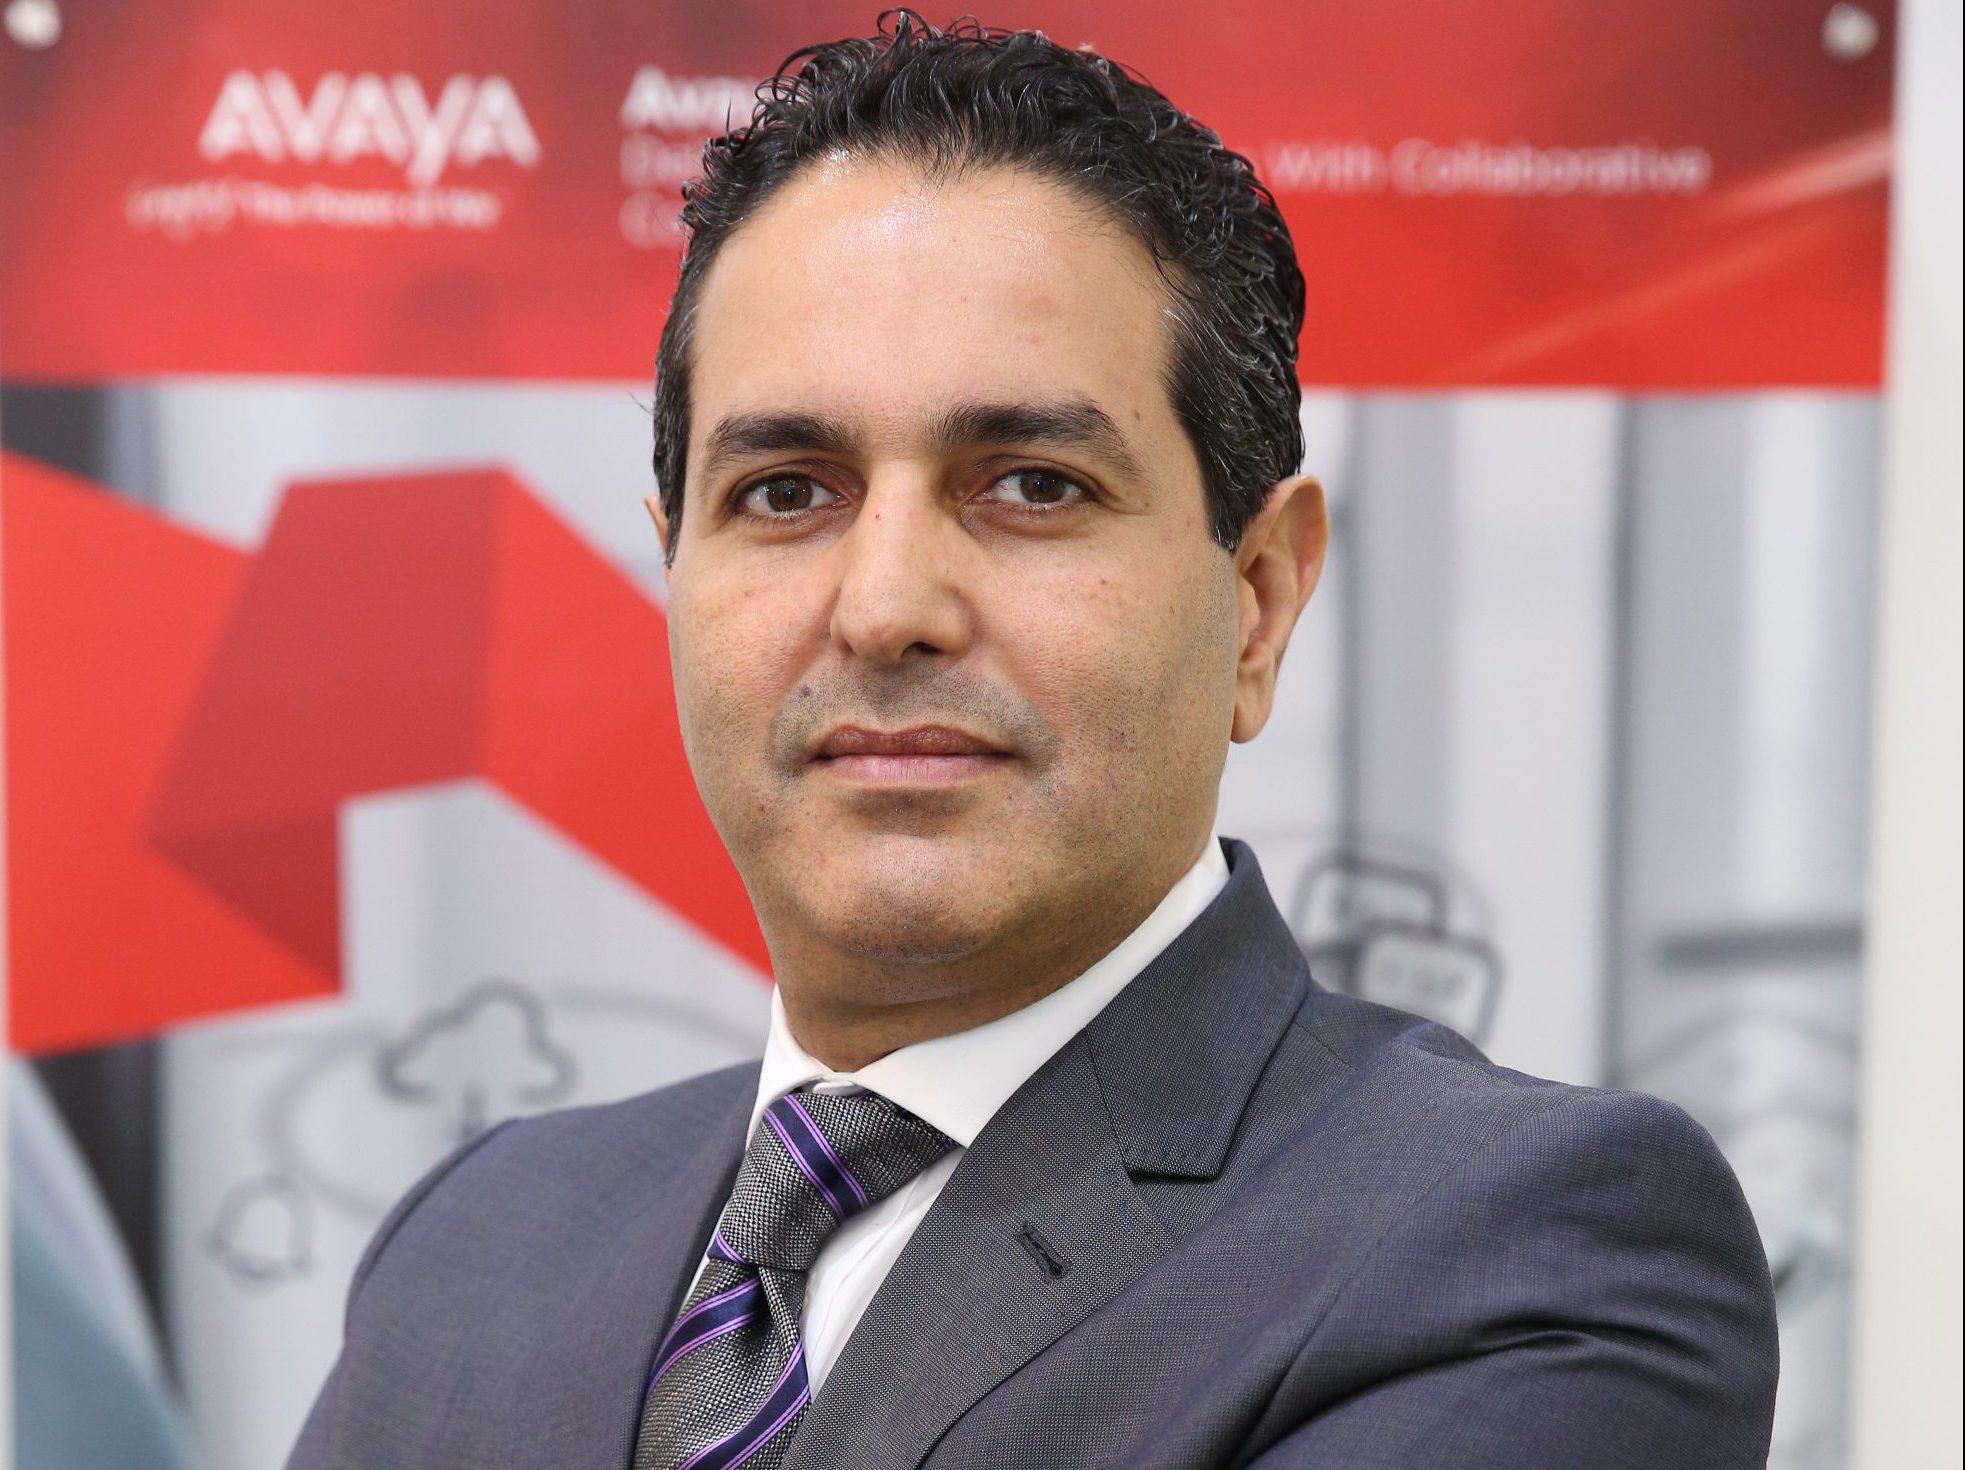 Saudi government drives digitisation to boost non-oil economy